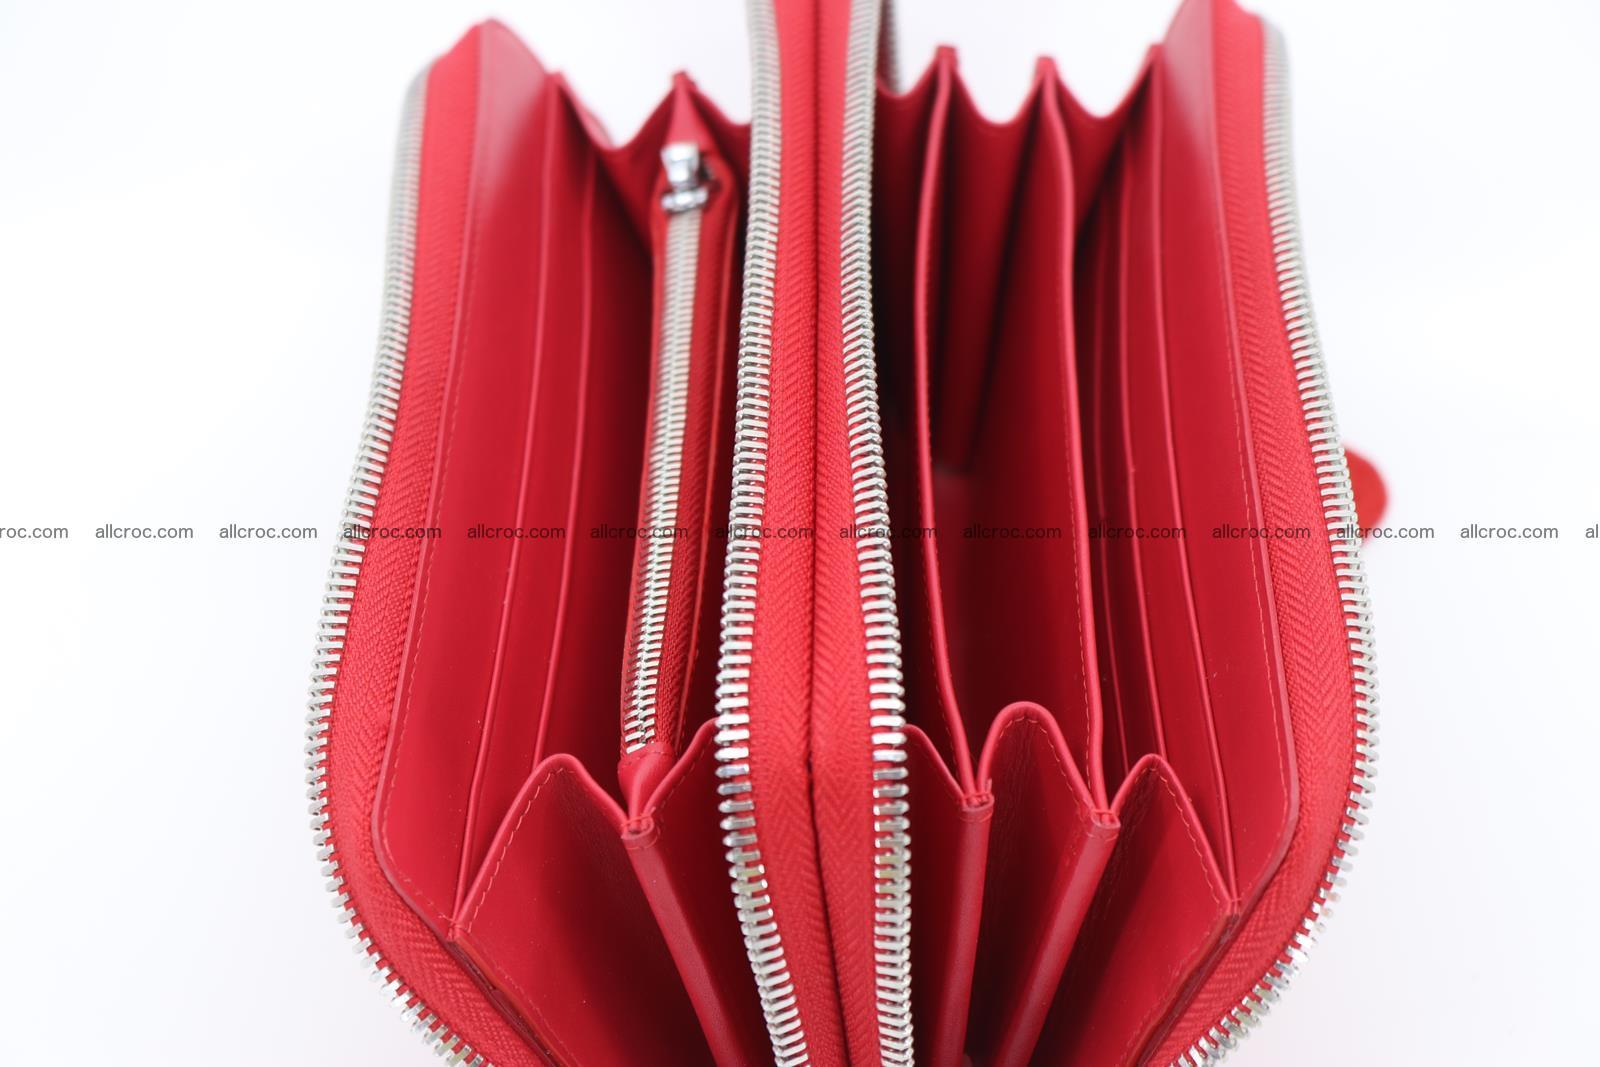 Crocodile skin clutch red color 2 zips 1263 Foto 13